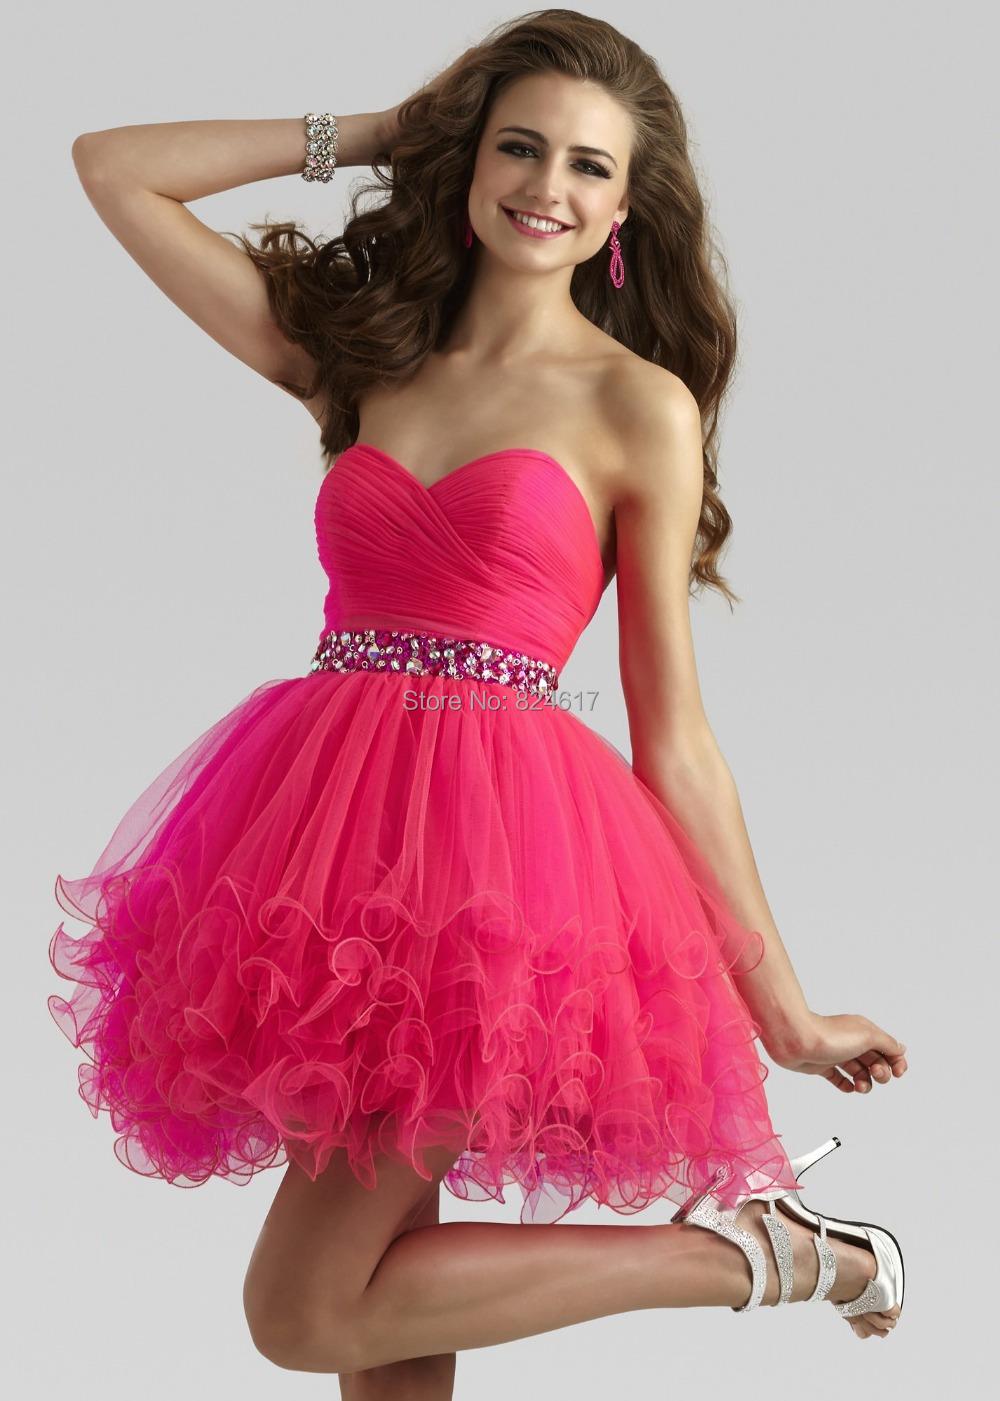 Cute Hot Pink Dresses